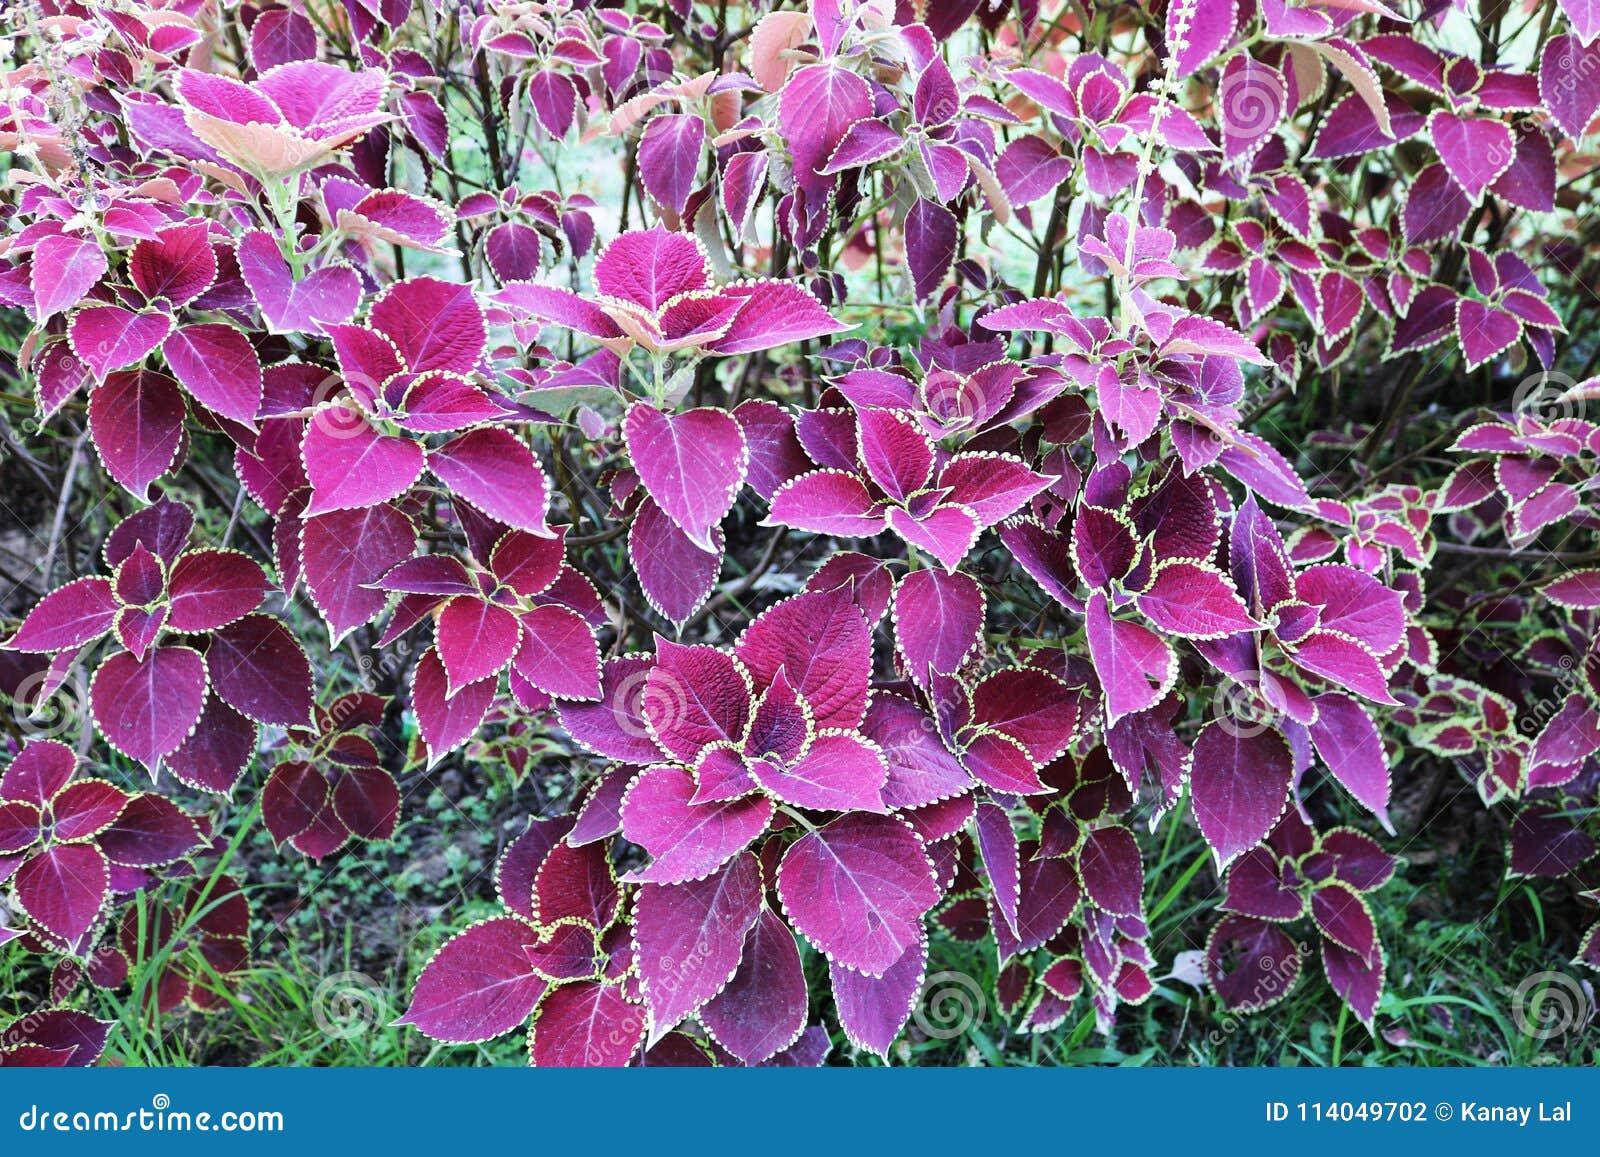 Colorful Leafs Solenostemon Scutellarioides Coleus Pink Dragon